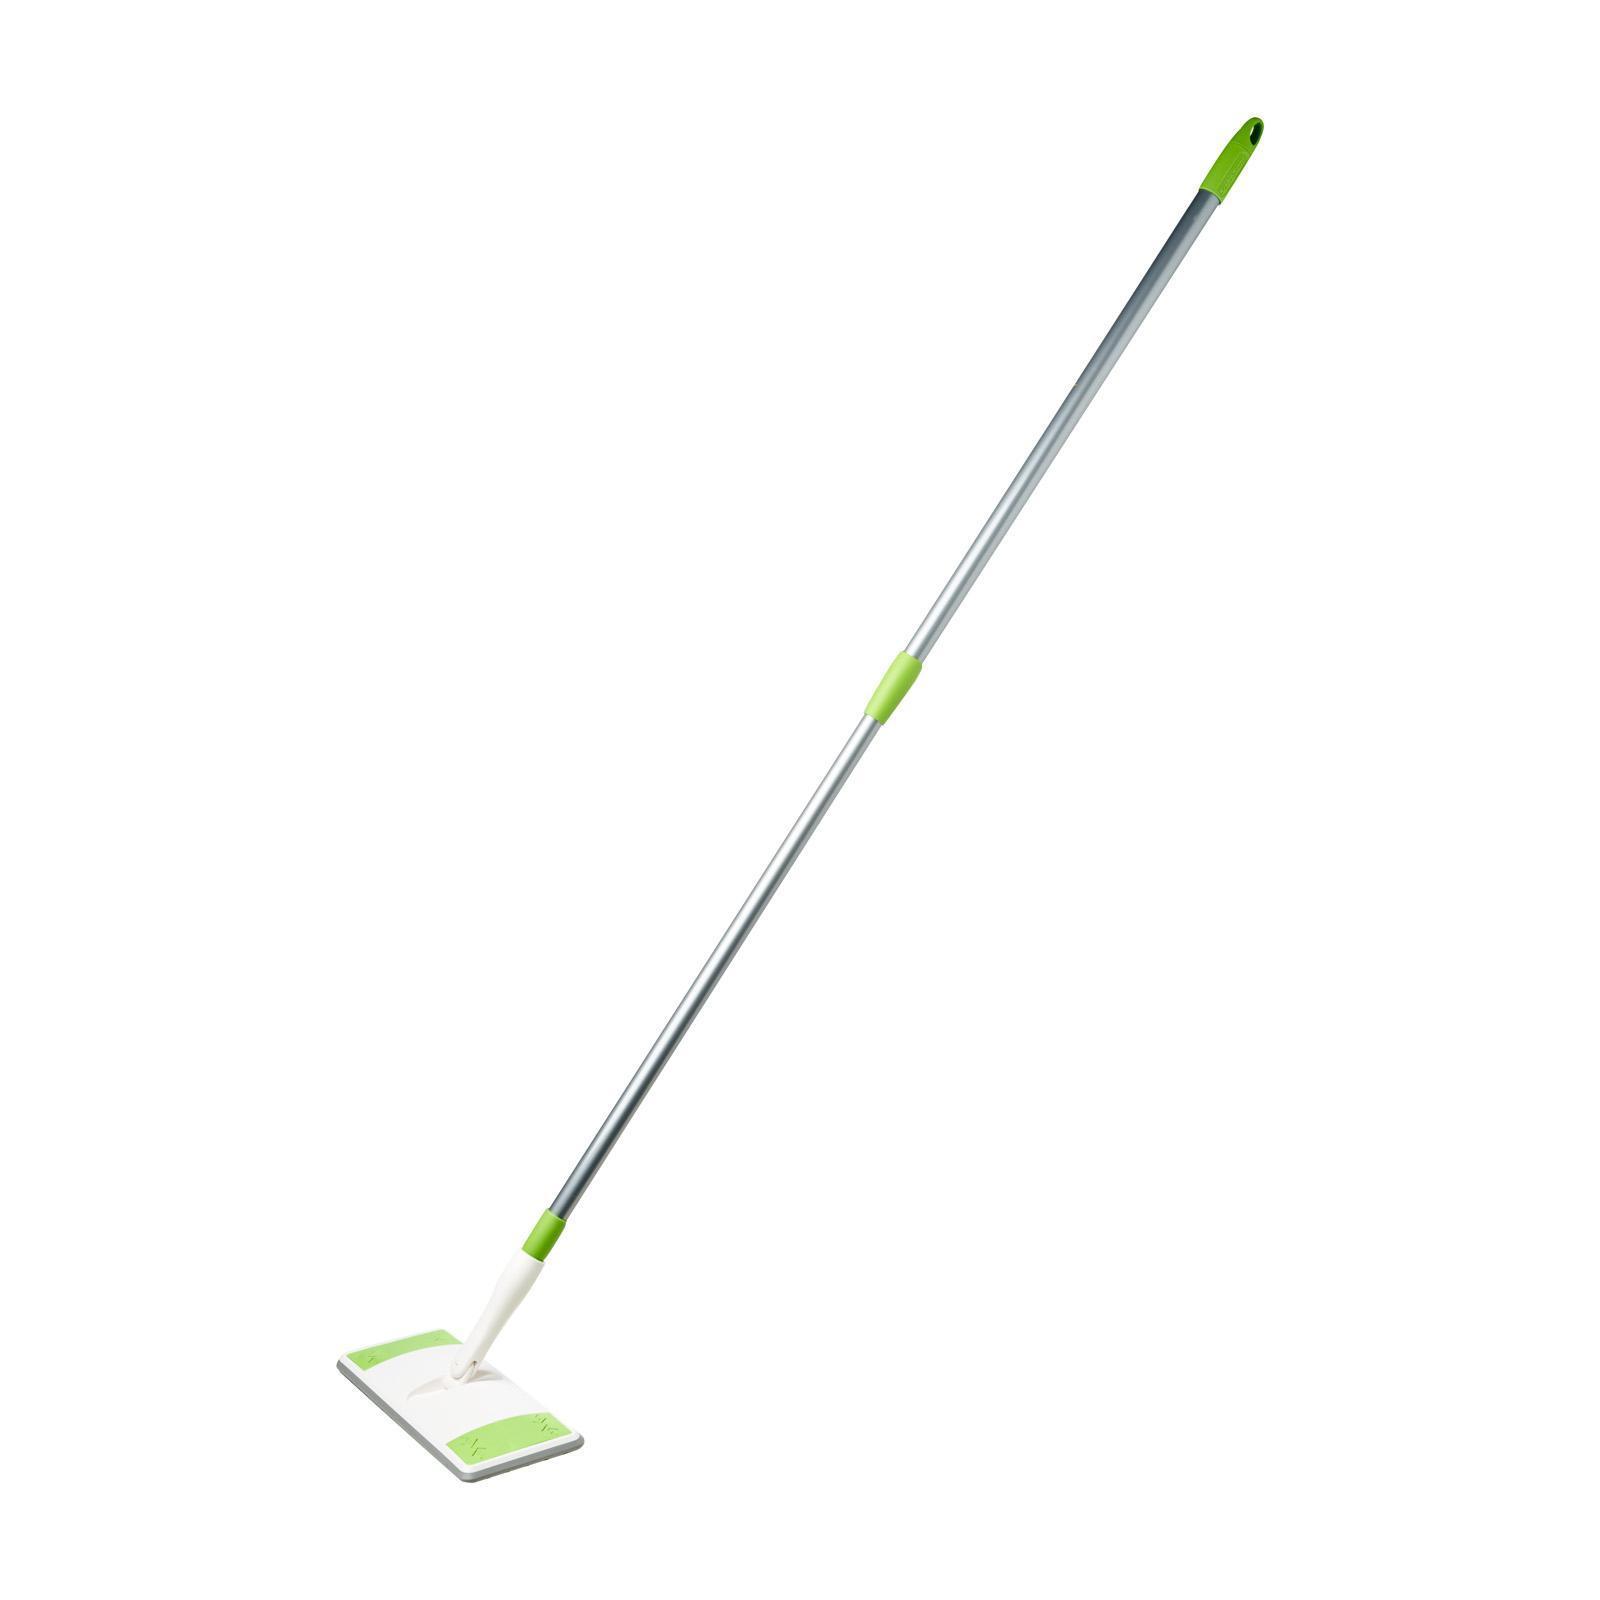 3M Scotch-Brite Easy Sweeper Plus Paperwiper Starter Kit